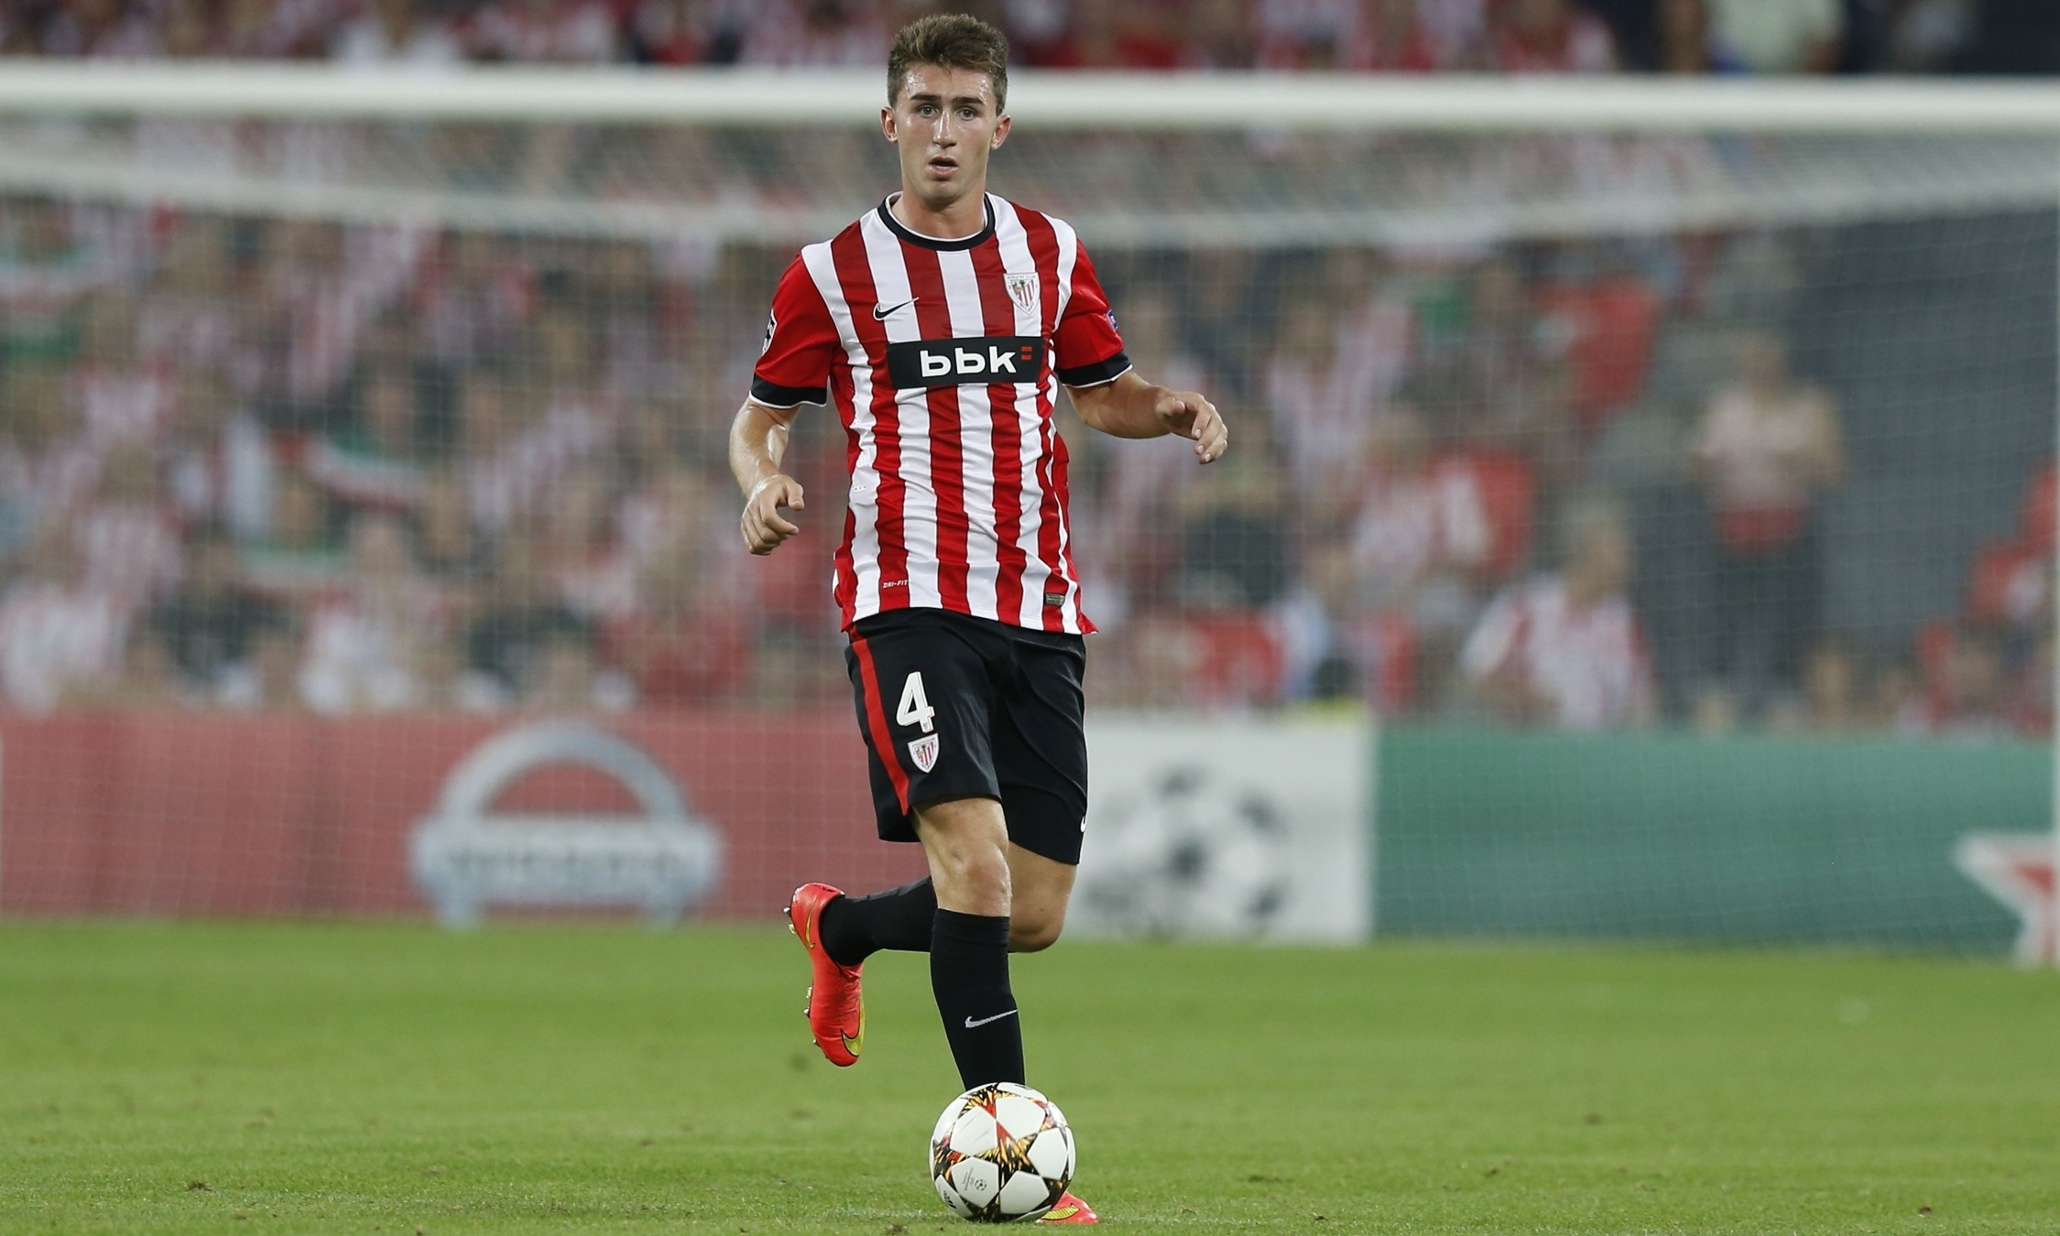 Athletic Bilbao v Napoli, UEFA Champions League qualifying second leg football match, Bilbao, Spain - 27 Aug 2014